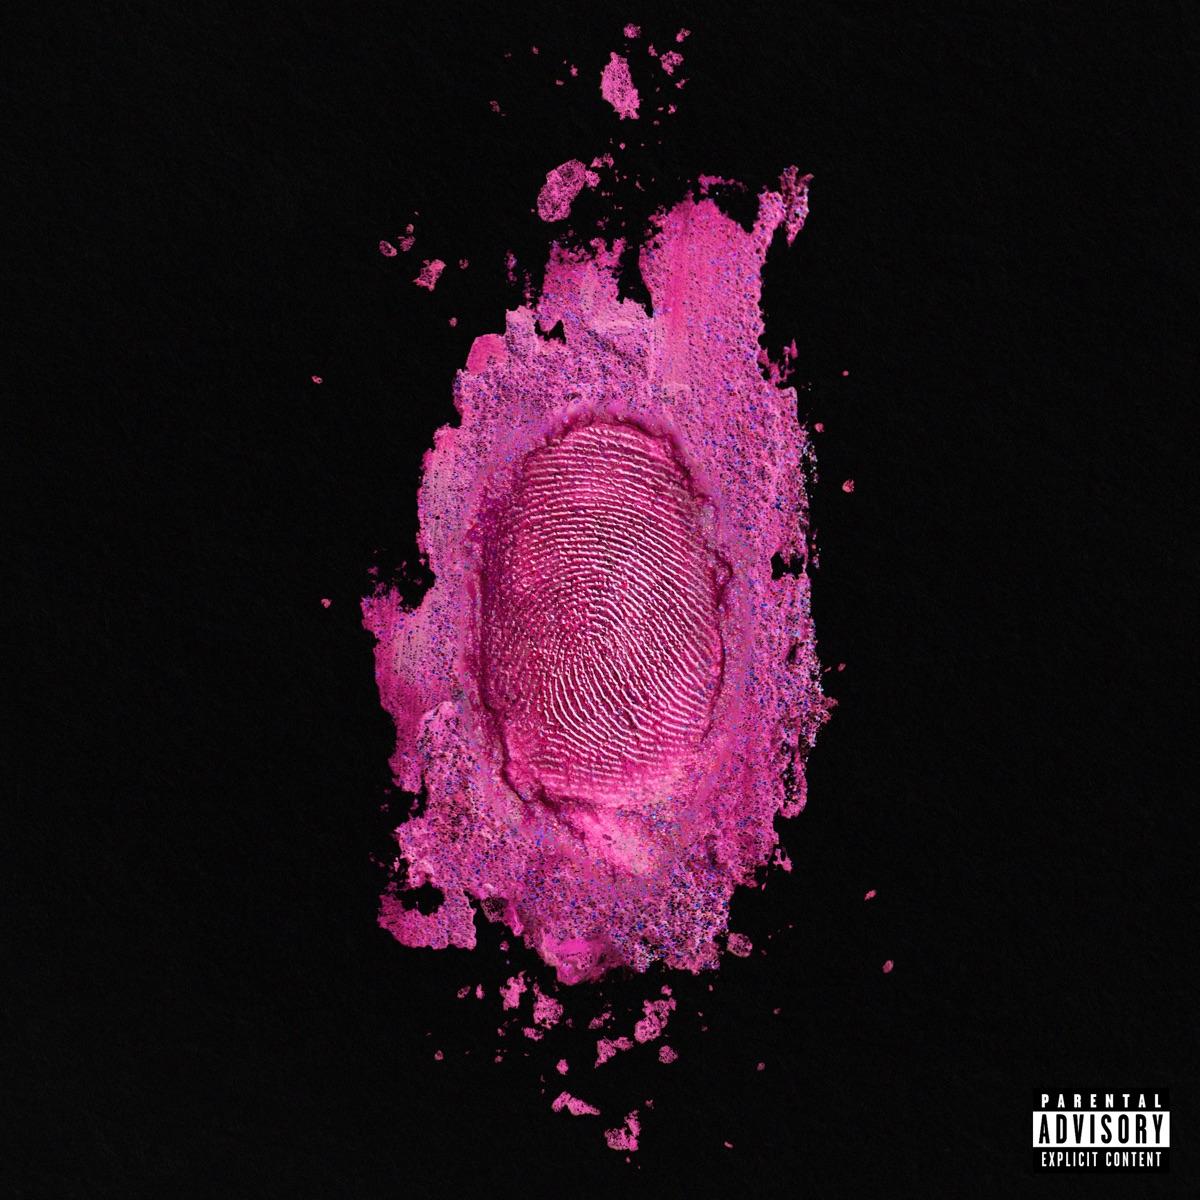 The Pinkprint Nicki Minaj CD cover